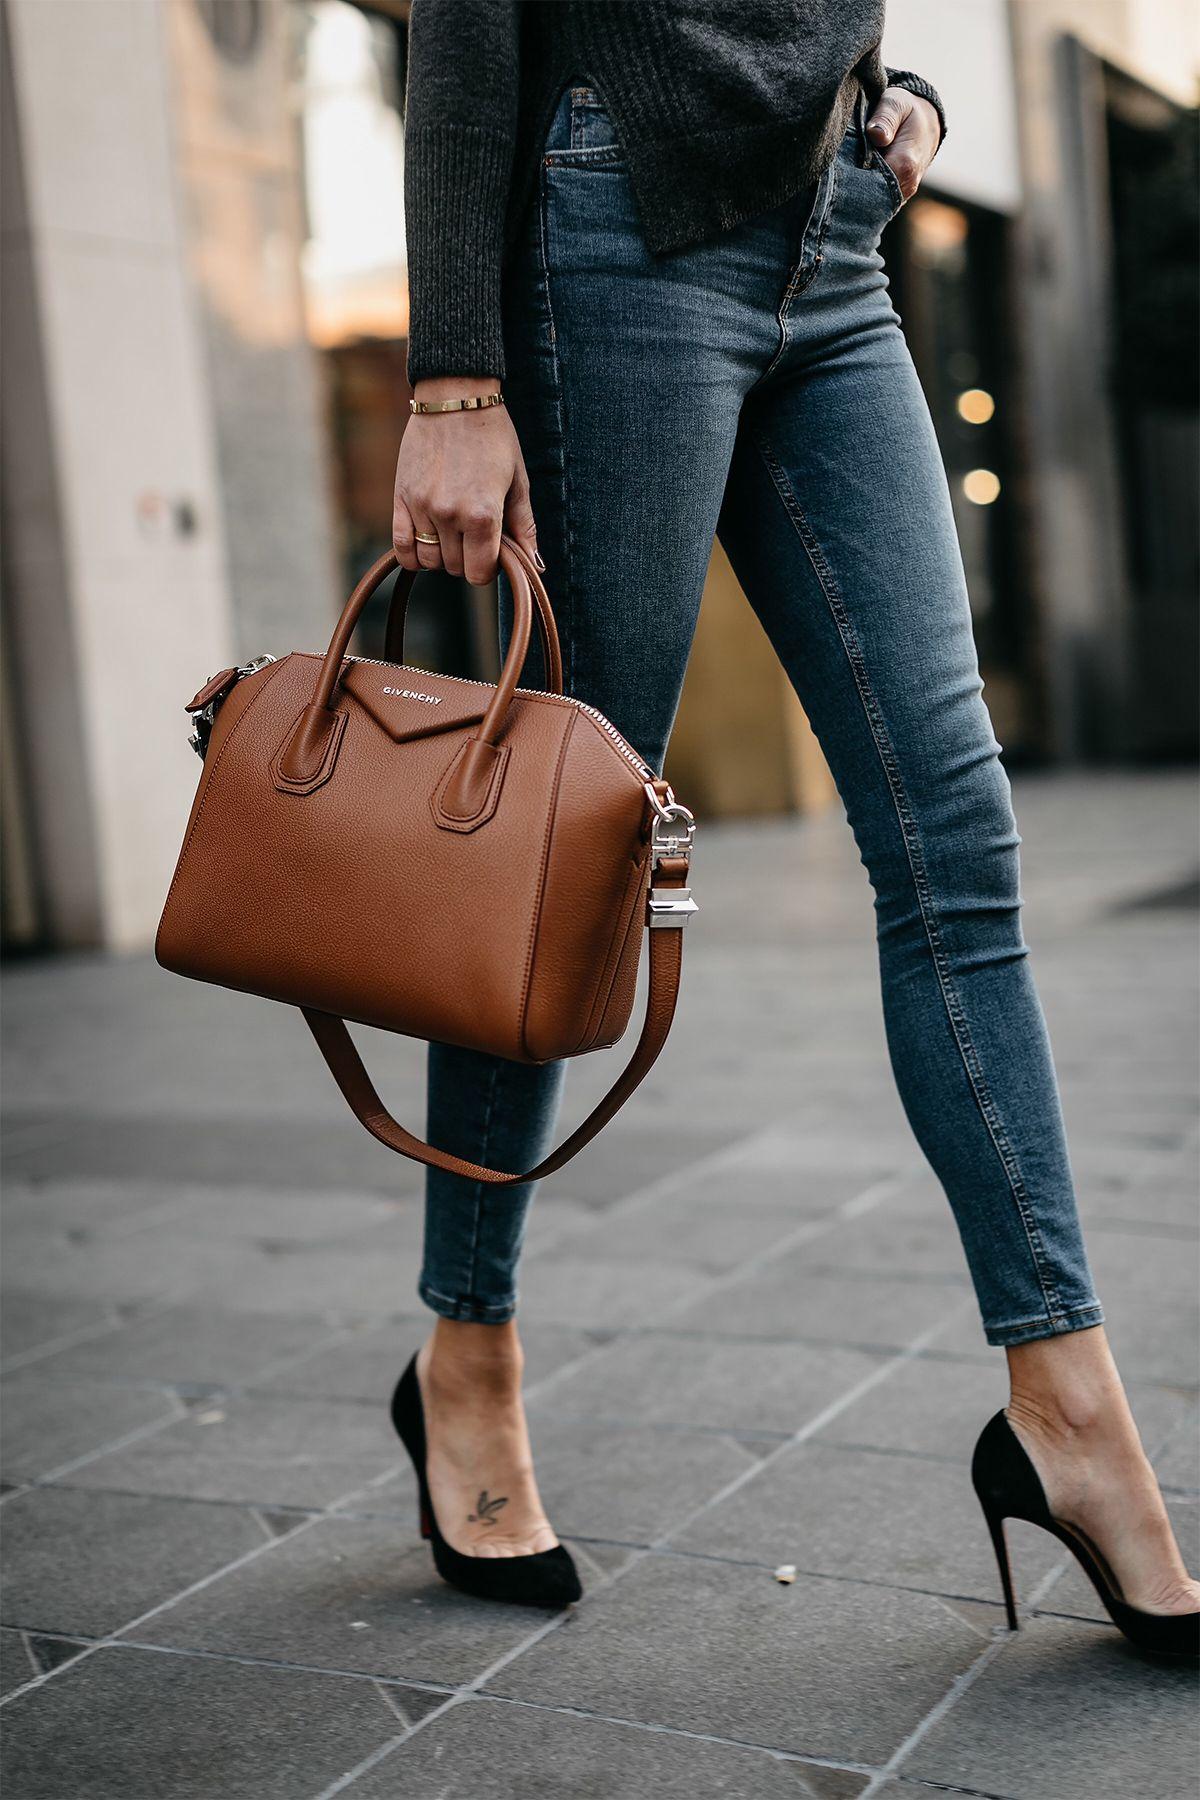 22a413798a11 Denim Skinny Jeans Givenchy Antigona Cognac Handbag Black Pumps Fashion  Jackson Dallas Blogger Fashion Blogger Street Style